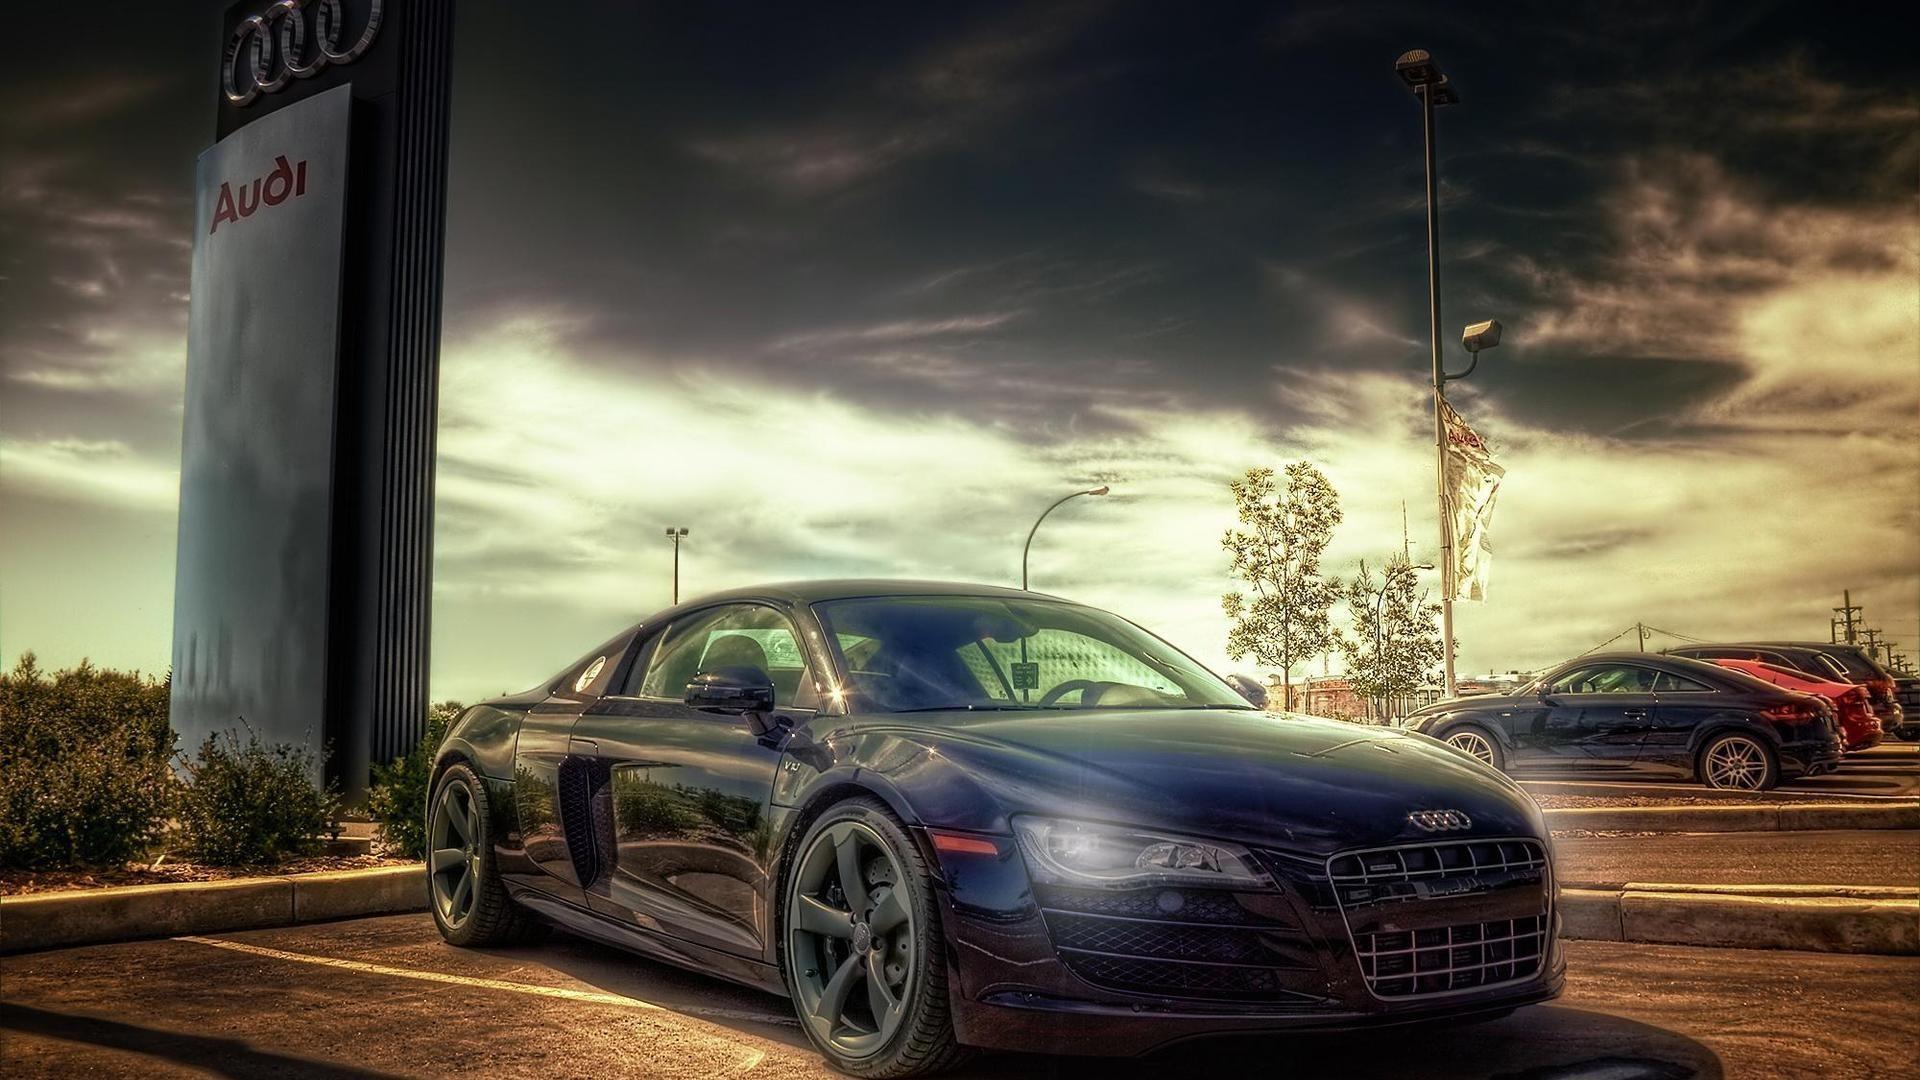 Cars parking HDR photography Audi R8 V10 wallpaper | | 184977 |  WallpaperUP